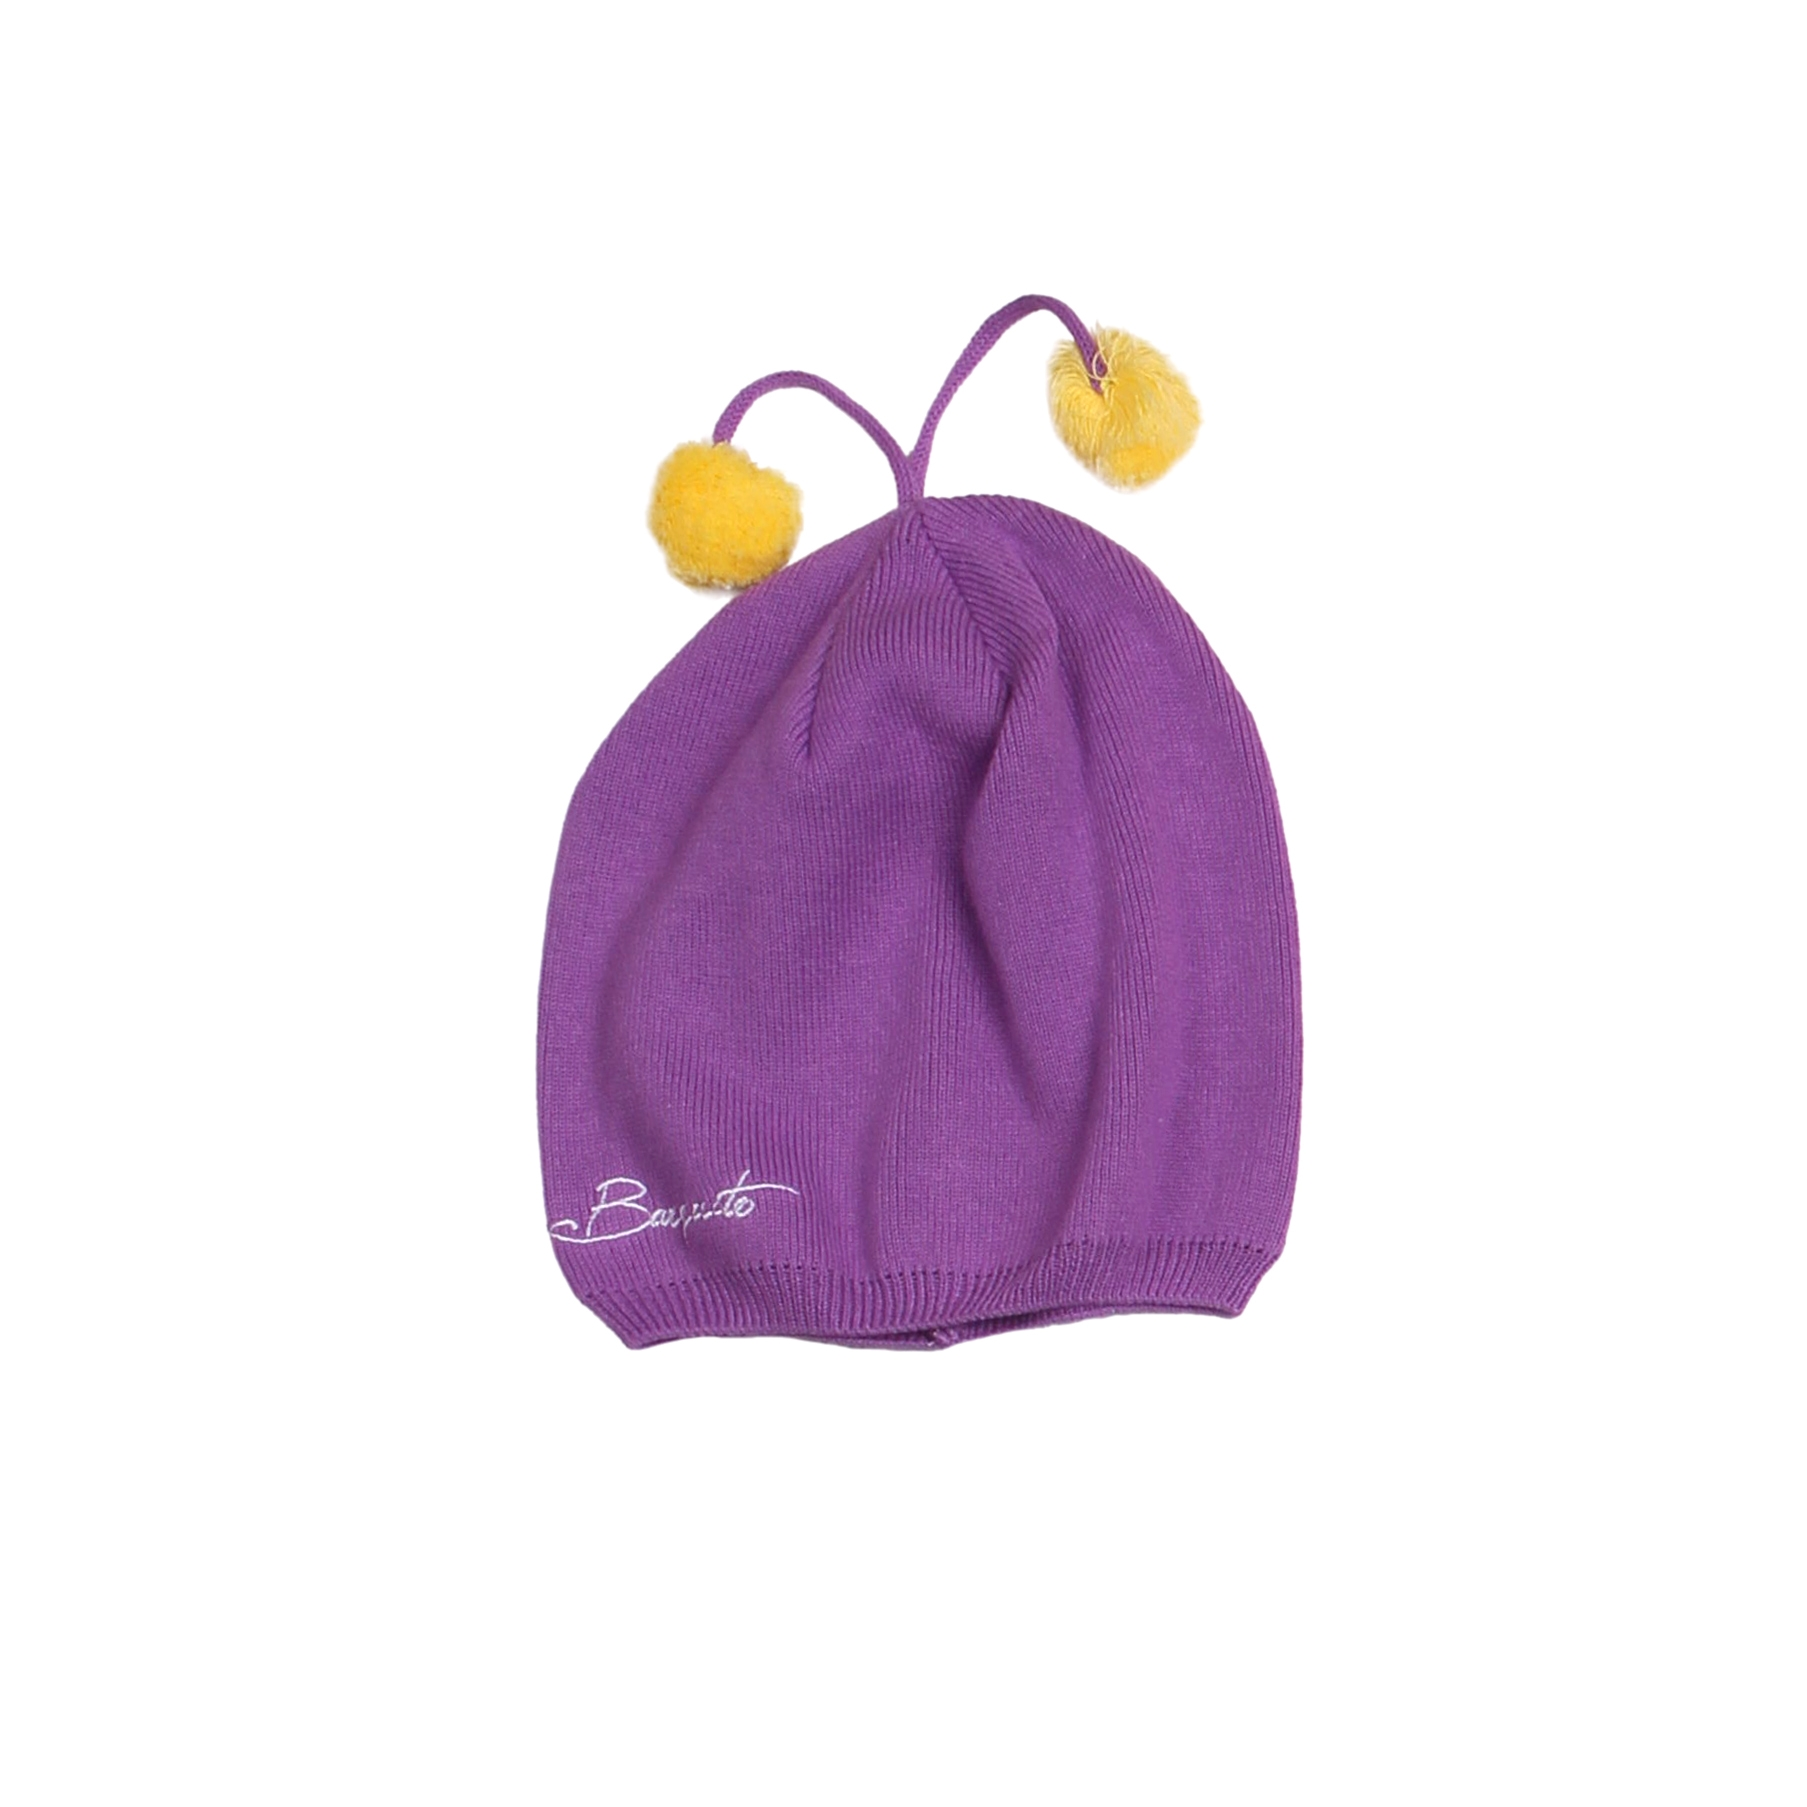 Шапка BARQUITO для девочки головные уборы barquito кепка для девочки спорт barquito синяя